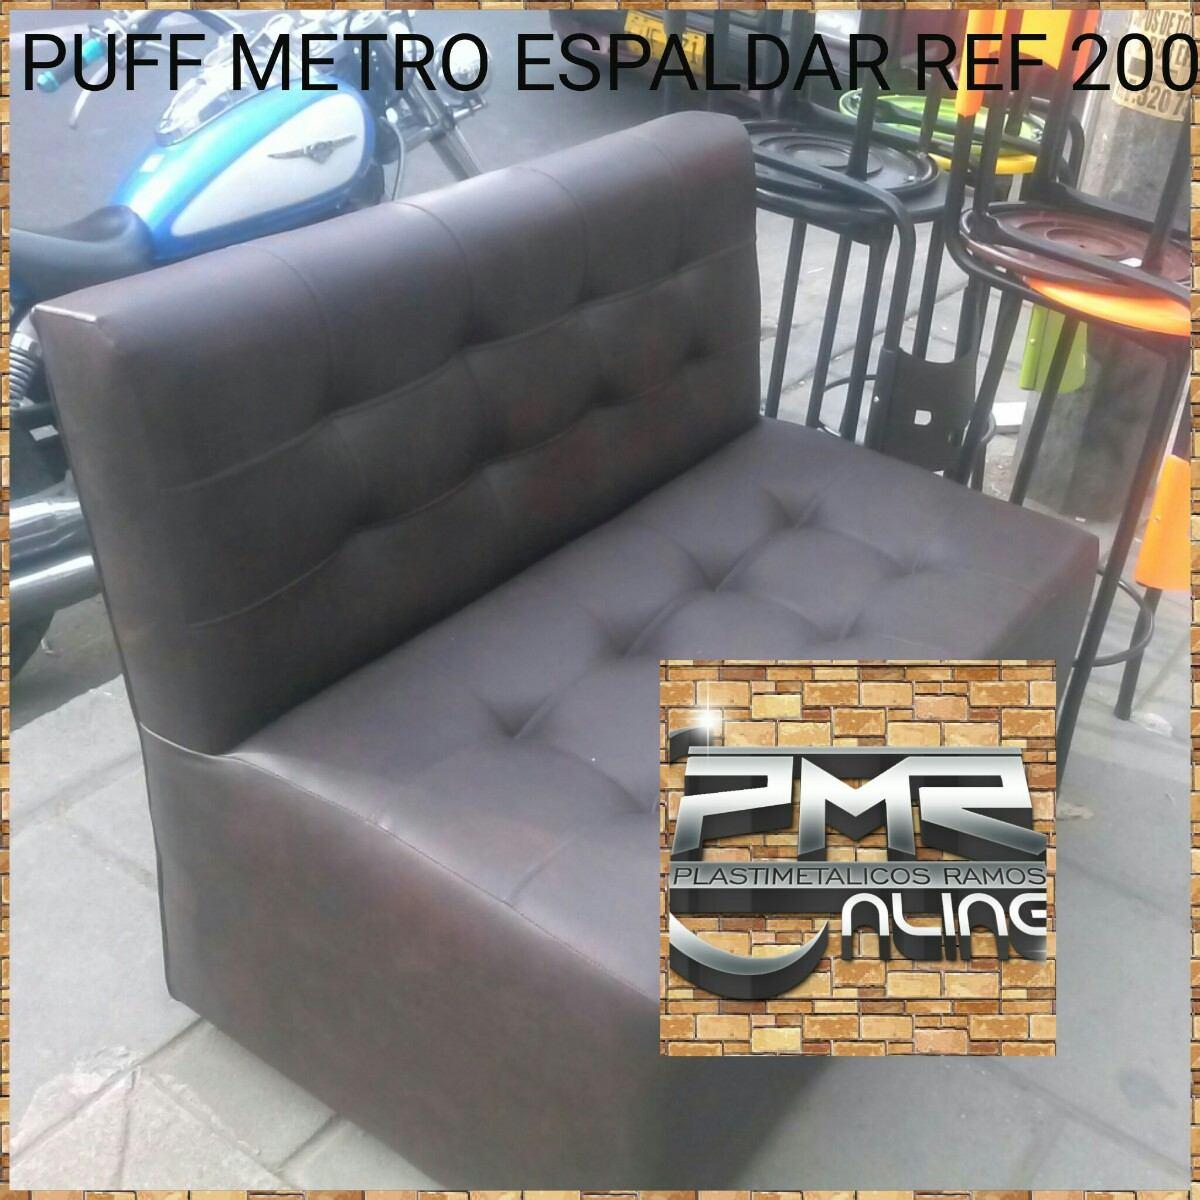 Sillas Puff Todo Para Puffs En Mercado Libre Colombia # Muebles Puffs Baratos